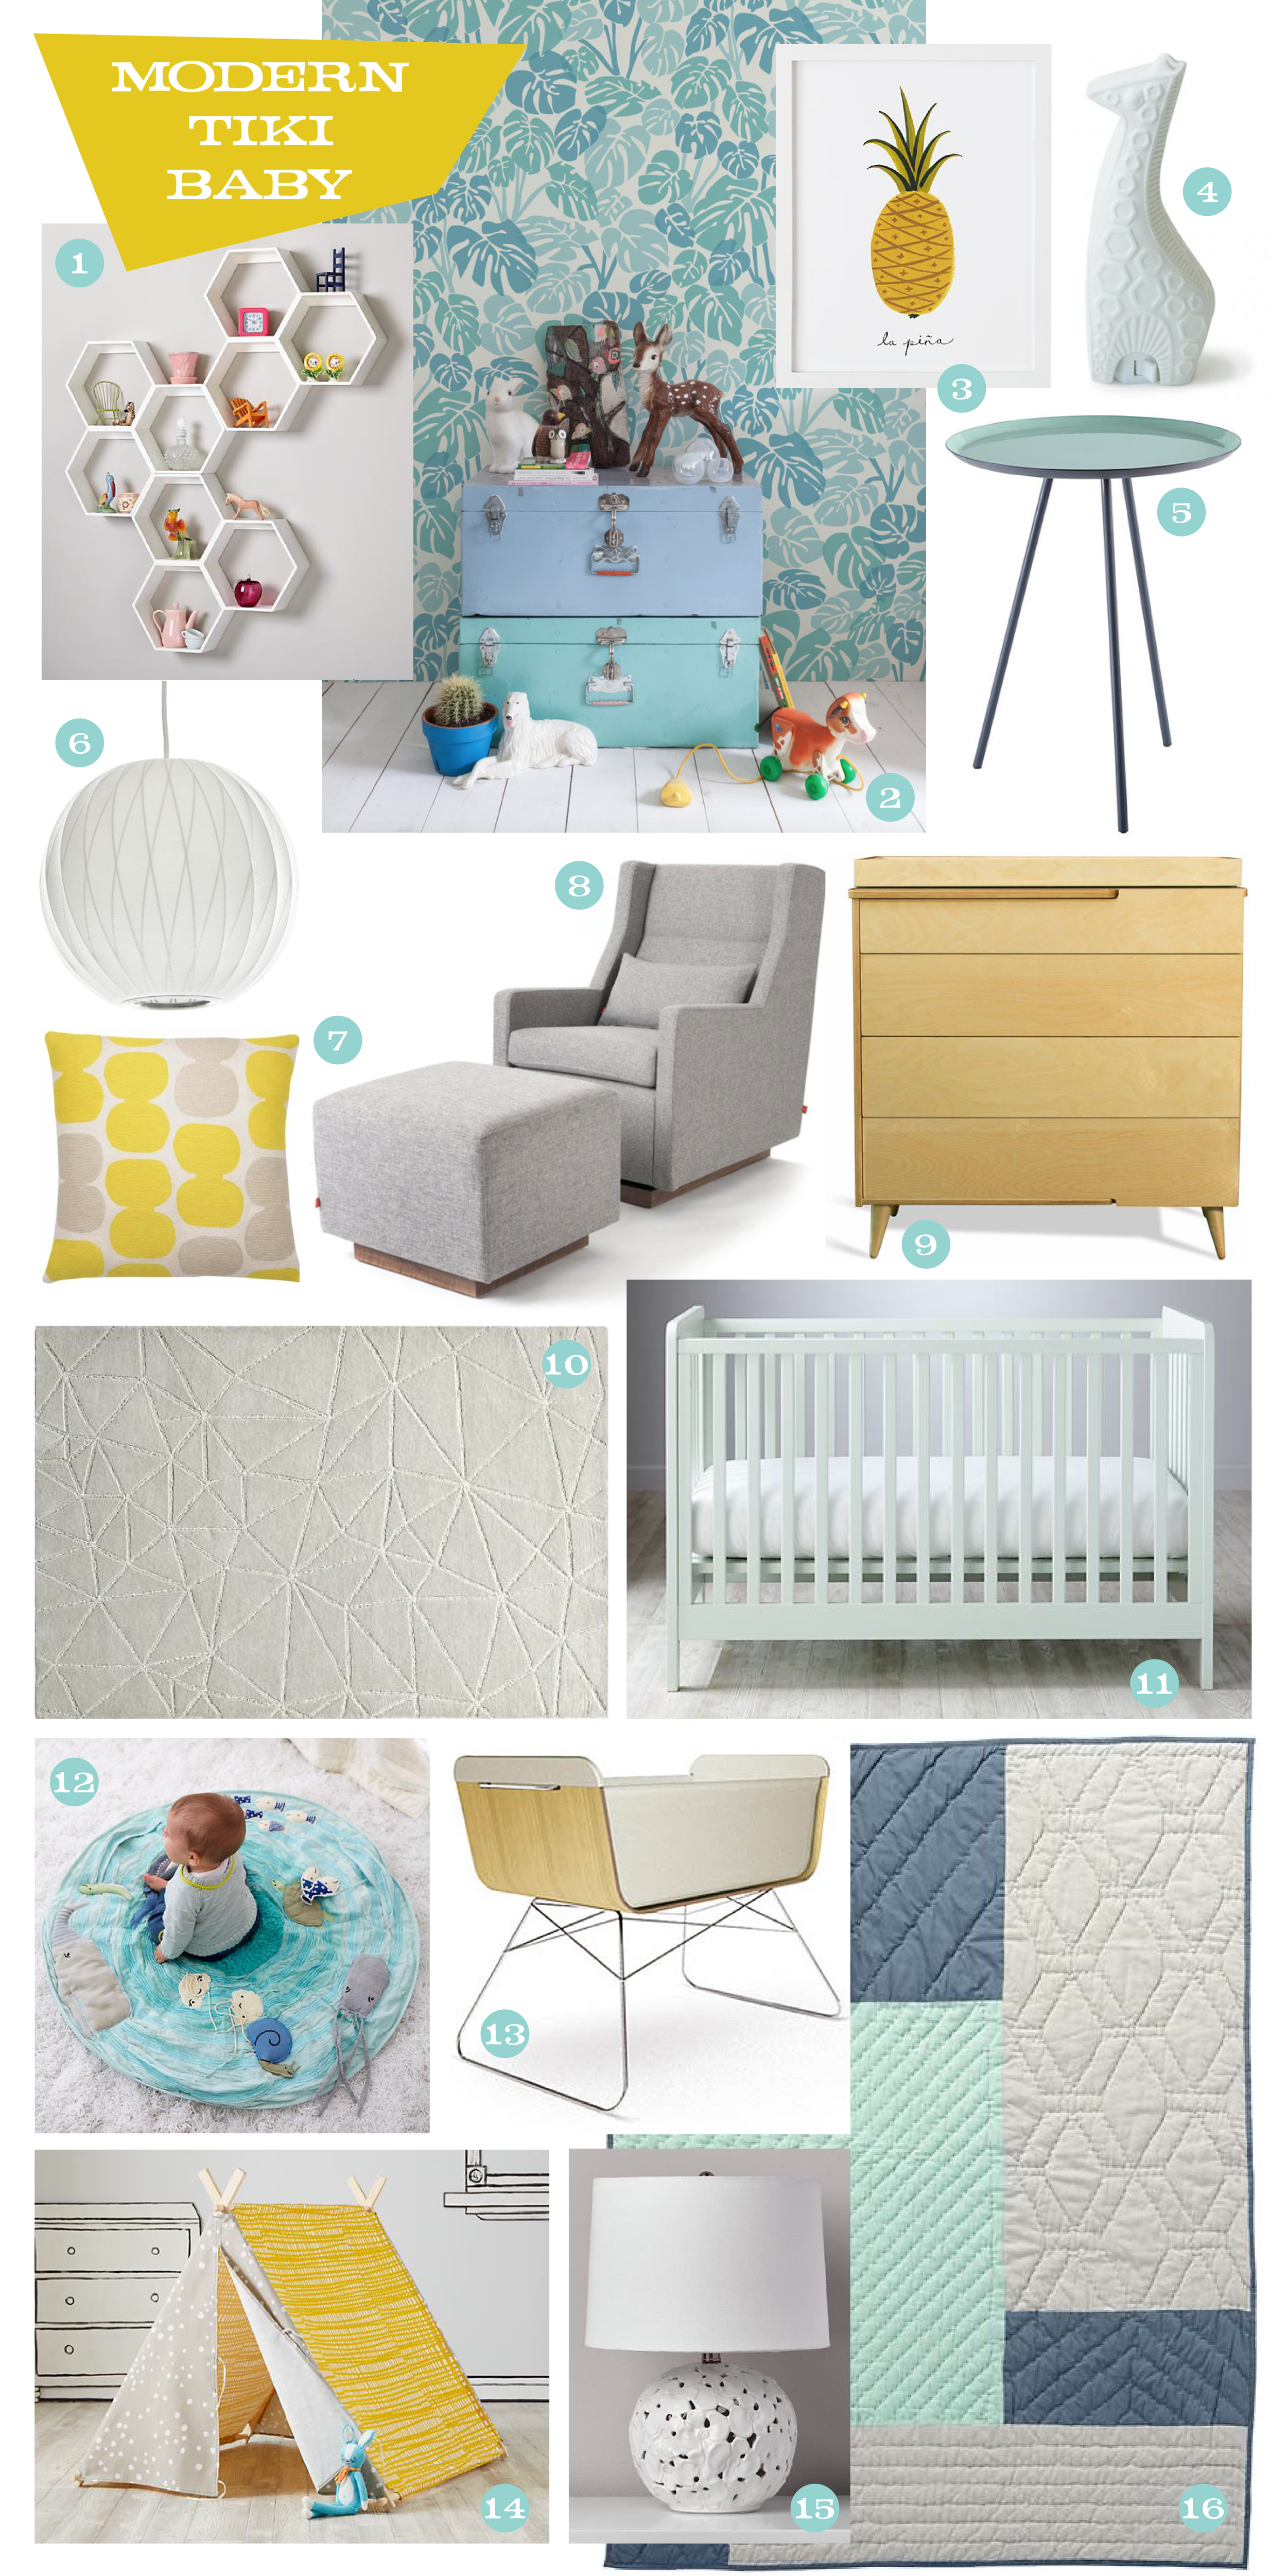 modern-tiki-baby-room.jpg